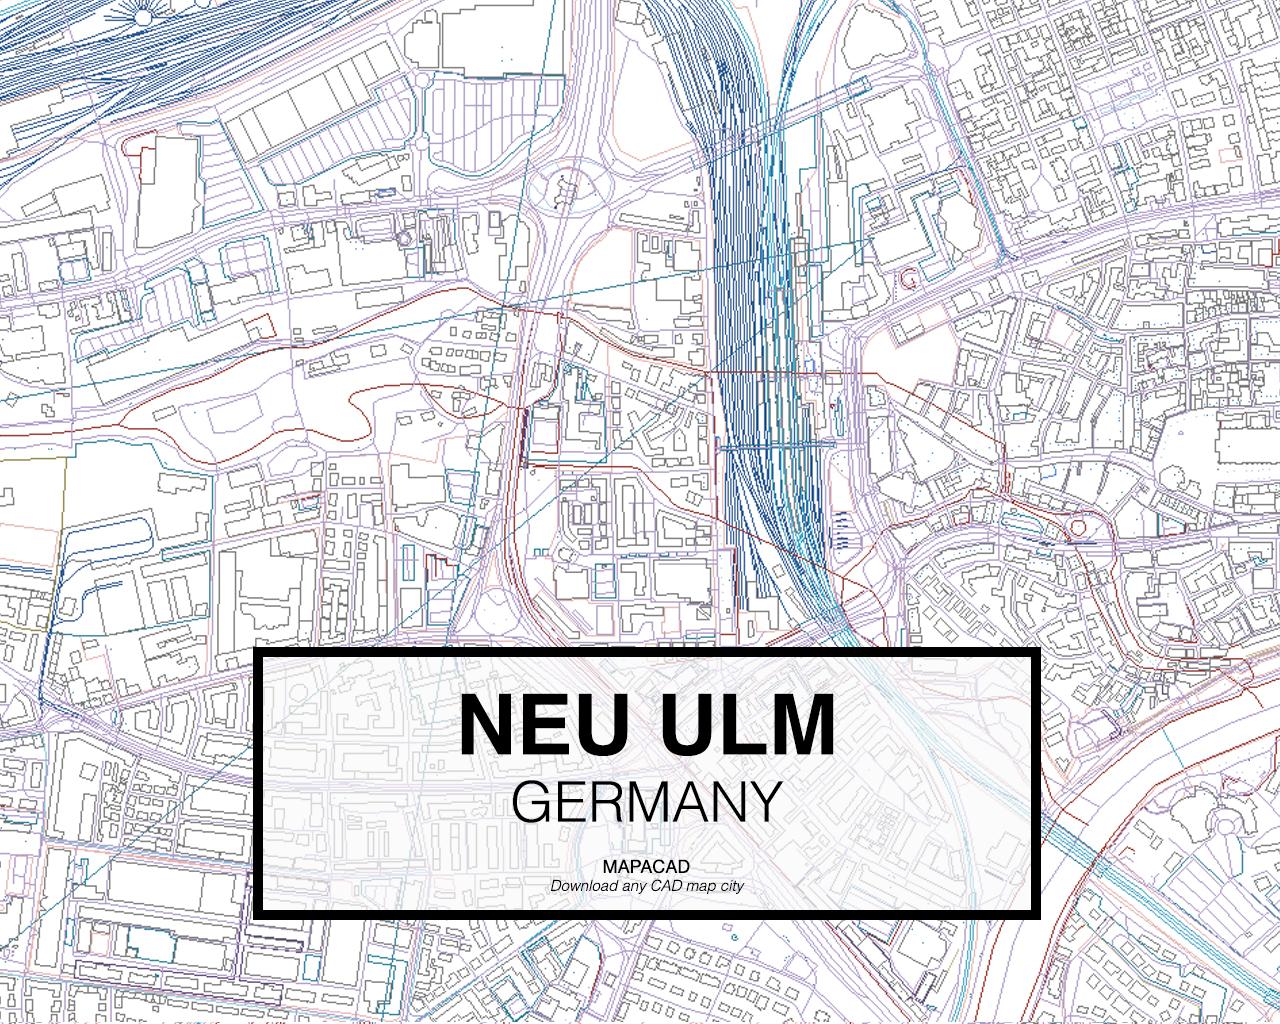 neu ulm germany 03 mapacad download map cad dwg dxf autocad free 2d 3d. Black Bedroom Furniture Sets. Home Design Ideas